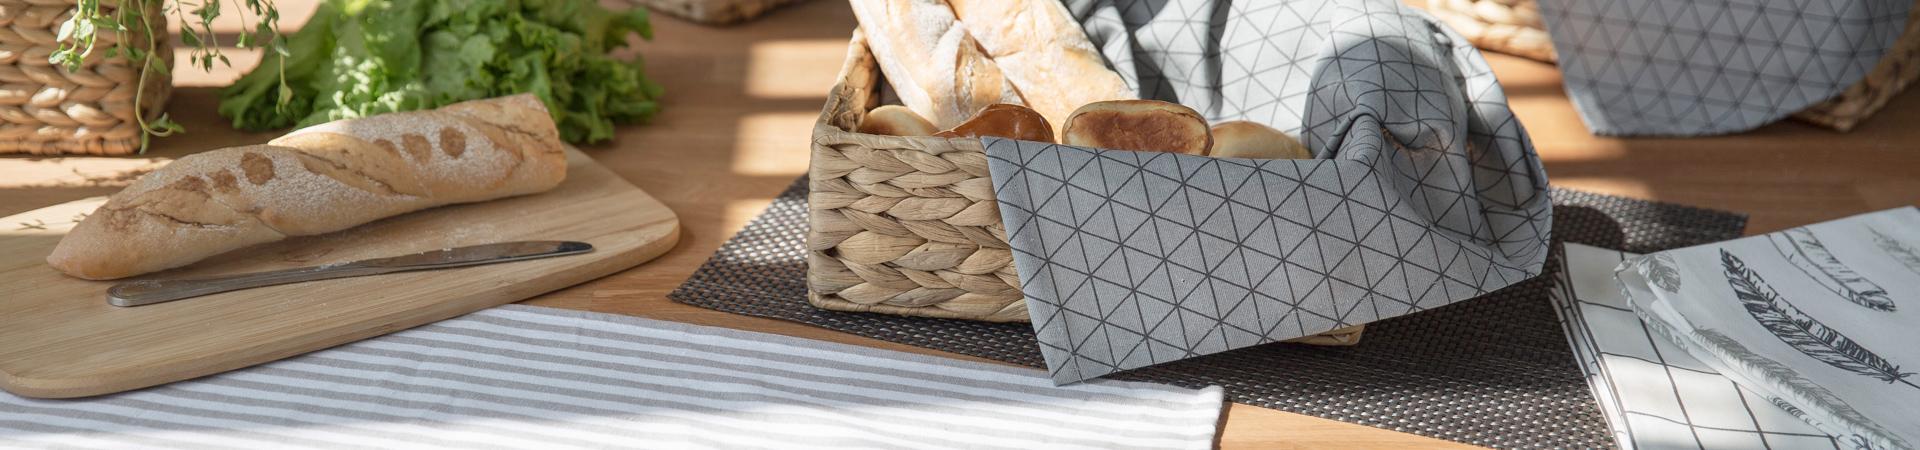 Virtuves tekstils